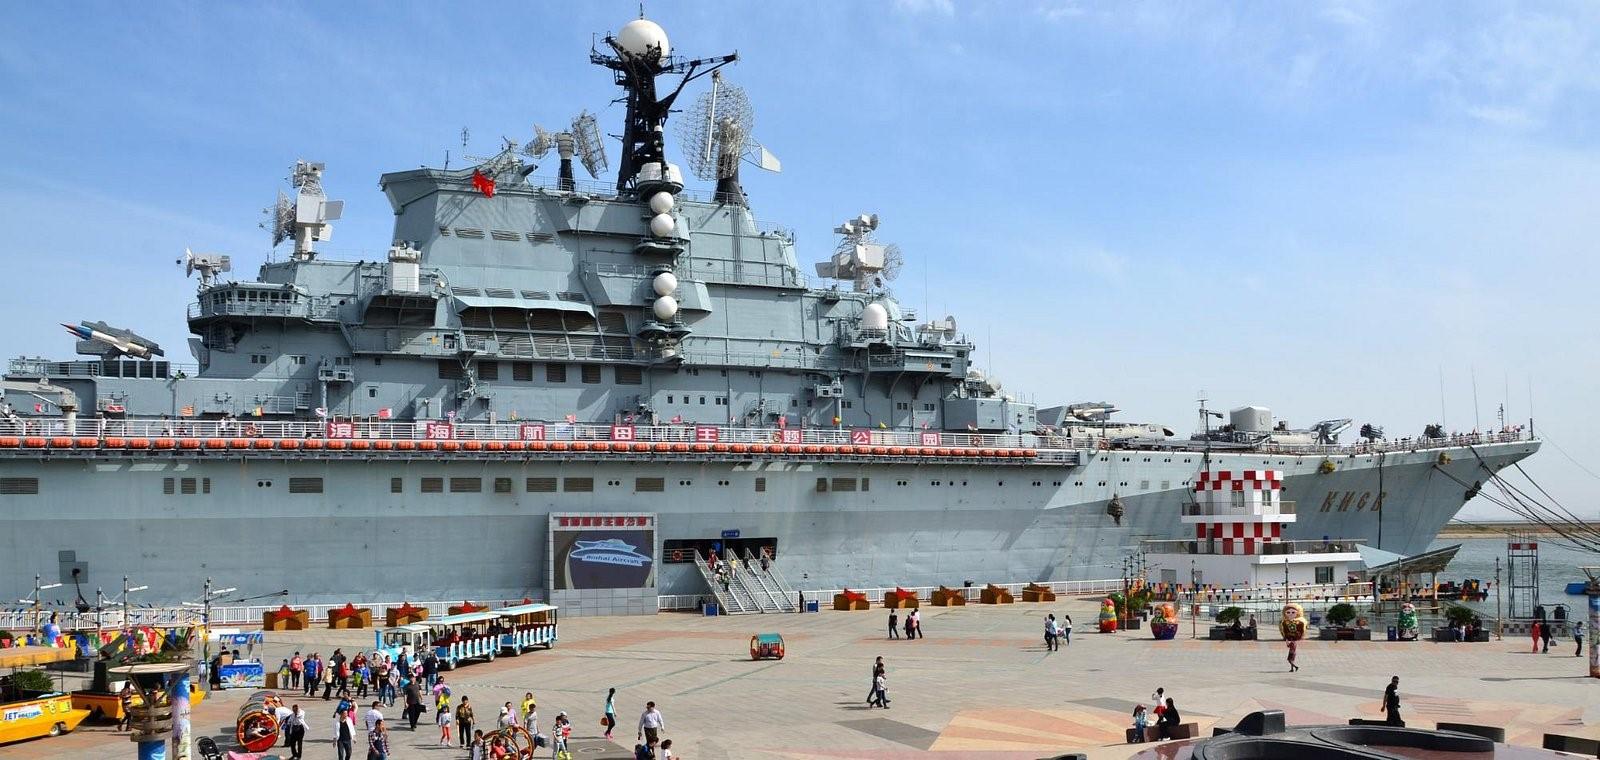 A theme park where fun meets learning: the Tianjin Binhai aircraft carrier - Sheet1